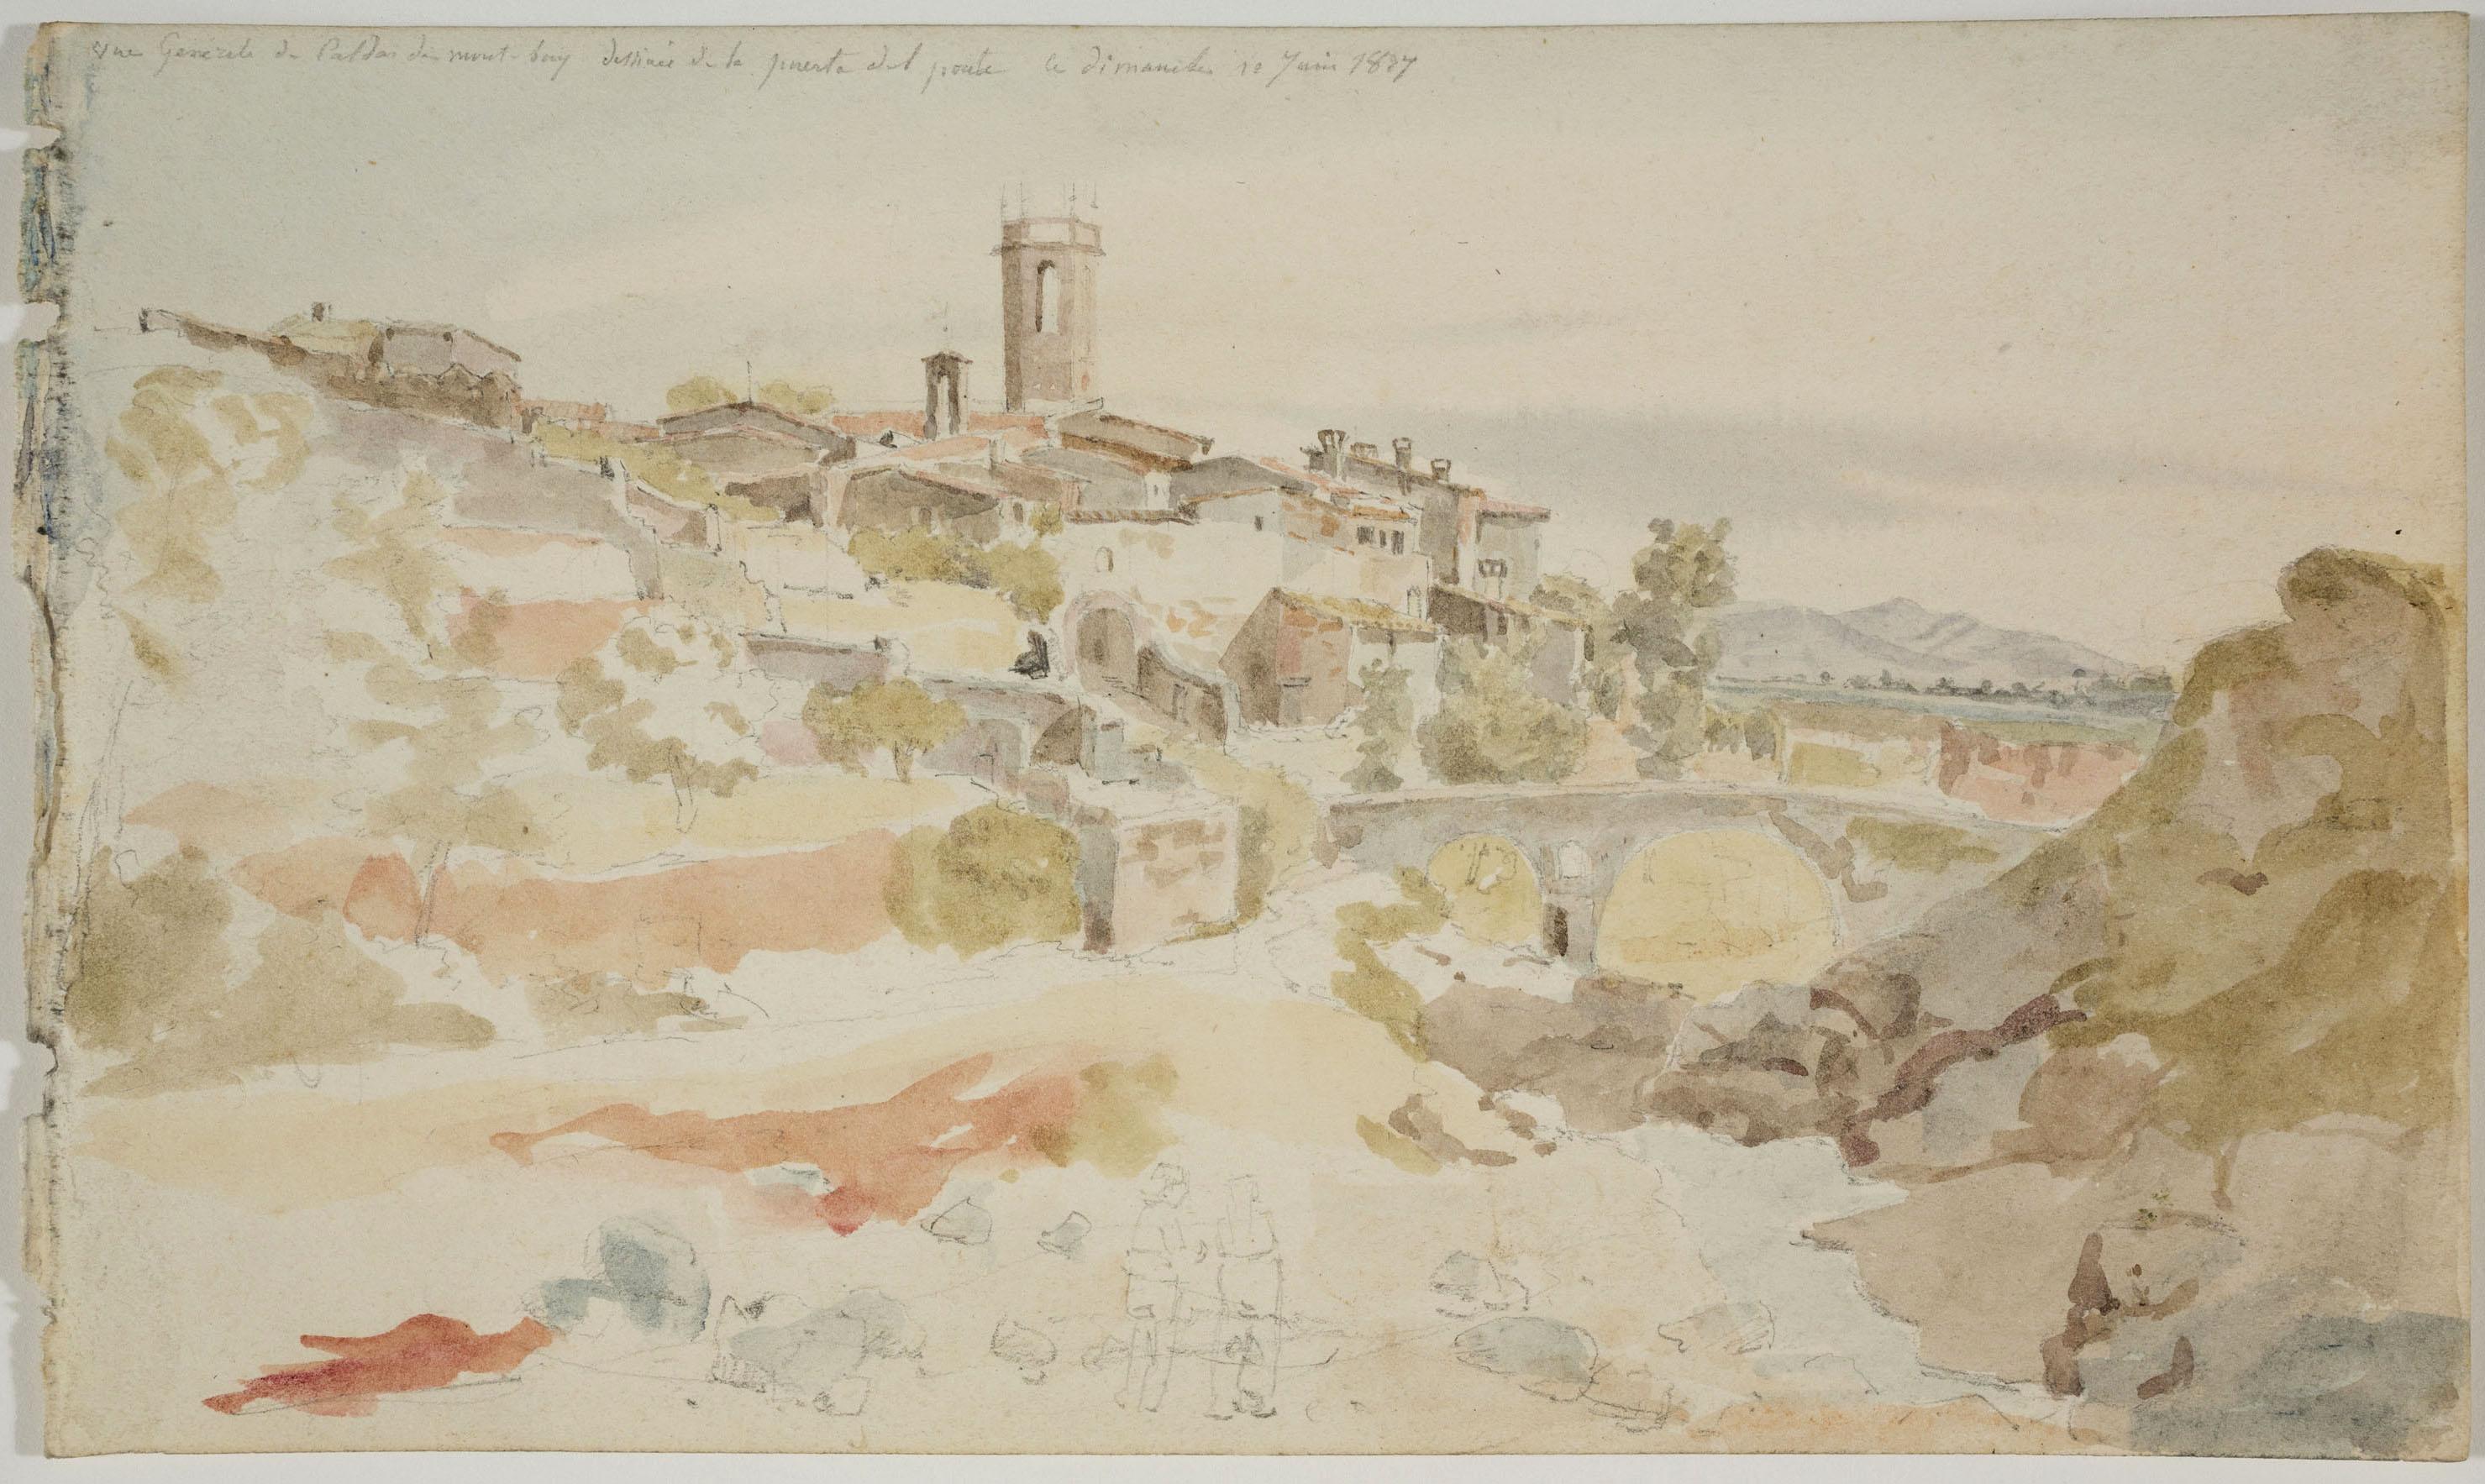 Adolphe Hedwige Alphonse Delamare - Vista de Caldes de Montbui amb el Pont - Diumenge 10 de juny de 1827